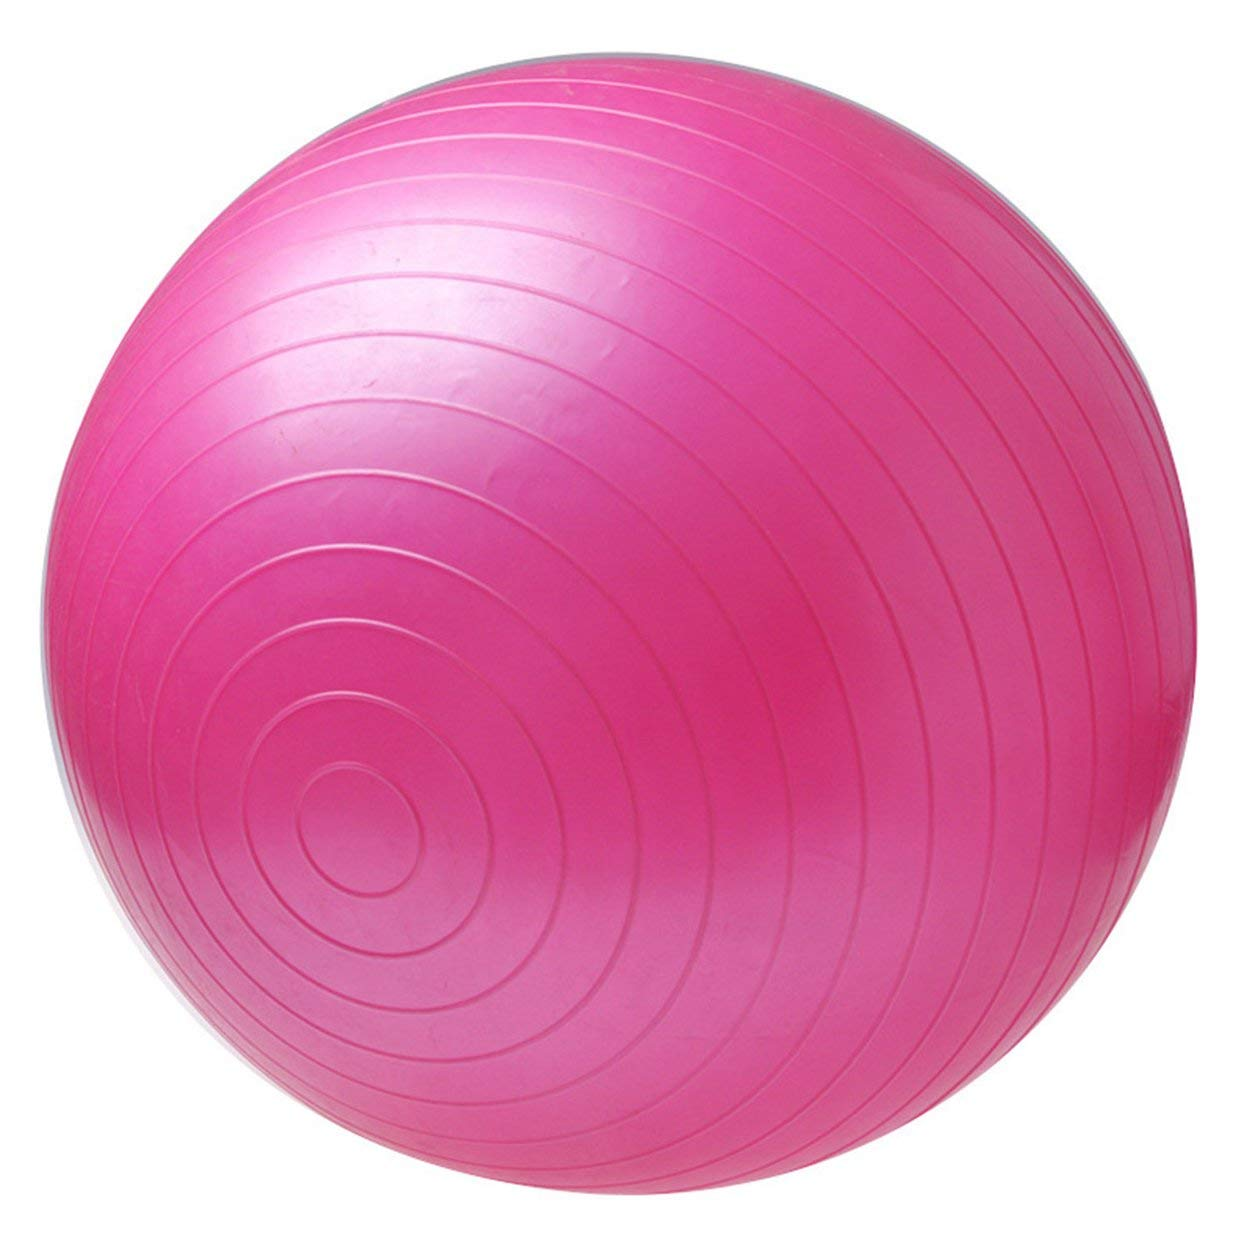 Amazon.com: anyilon Non-Toxic Sports Yoga Balls Bola Pilates ...